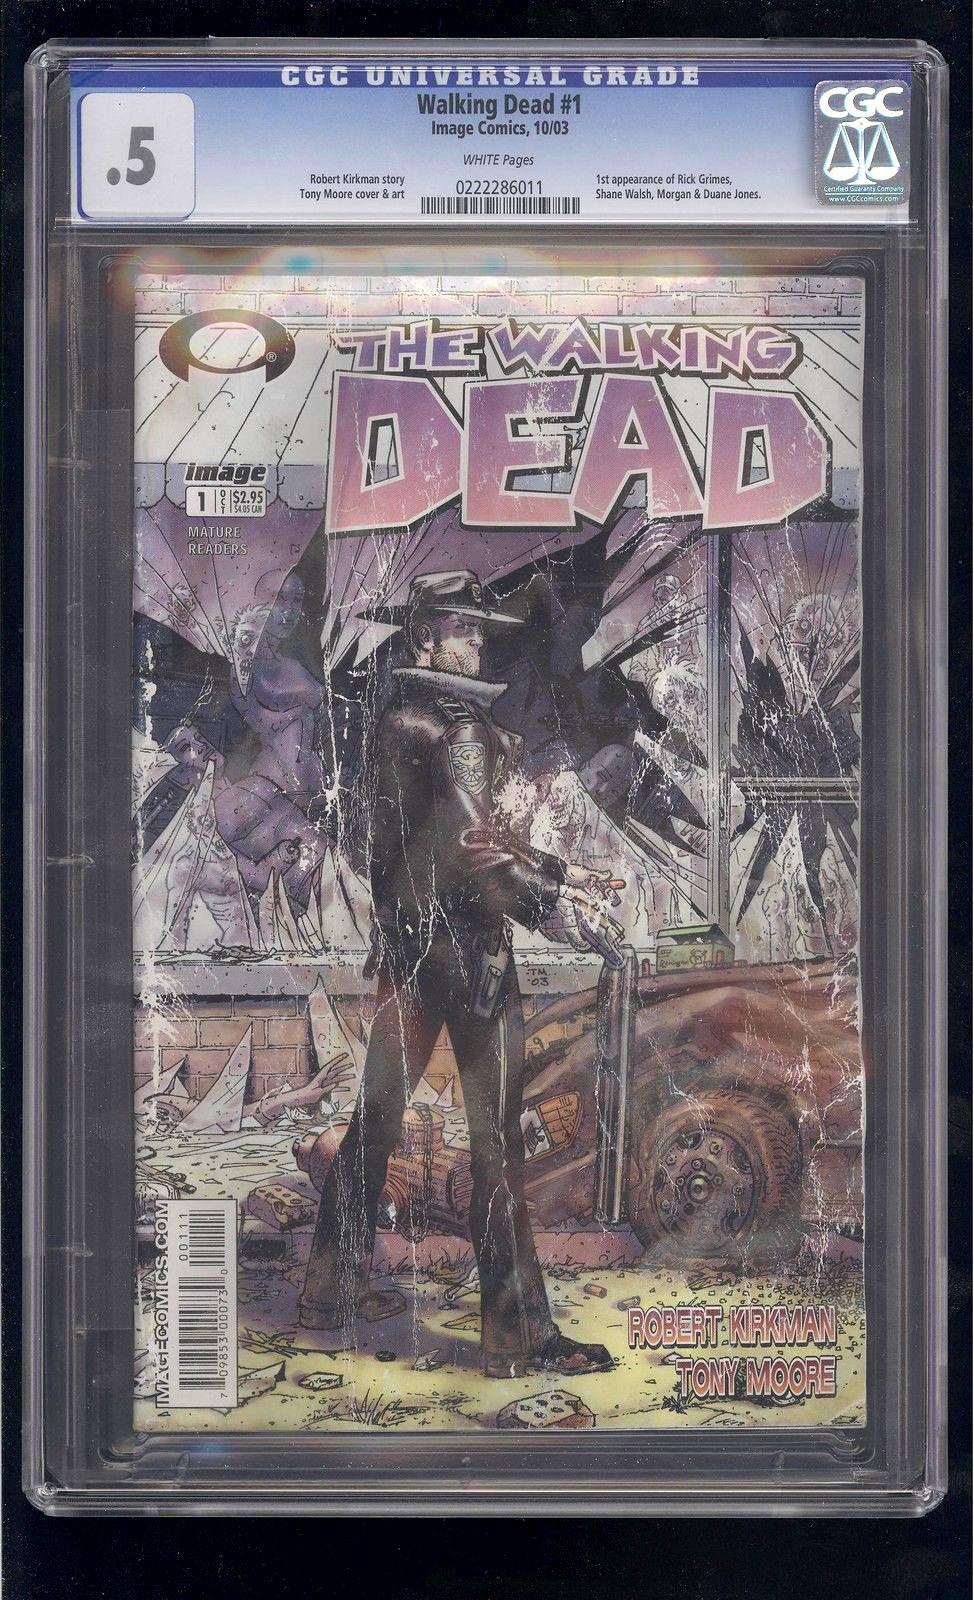 The Walking Dead CGC .5